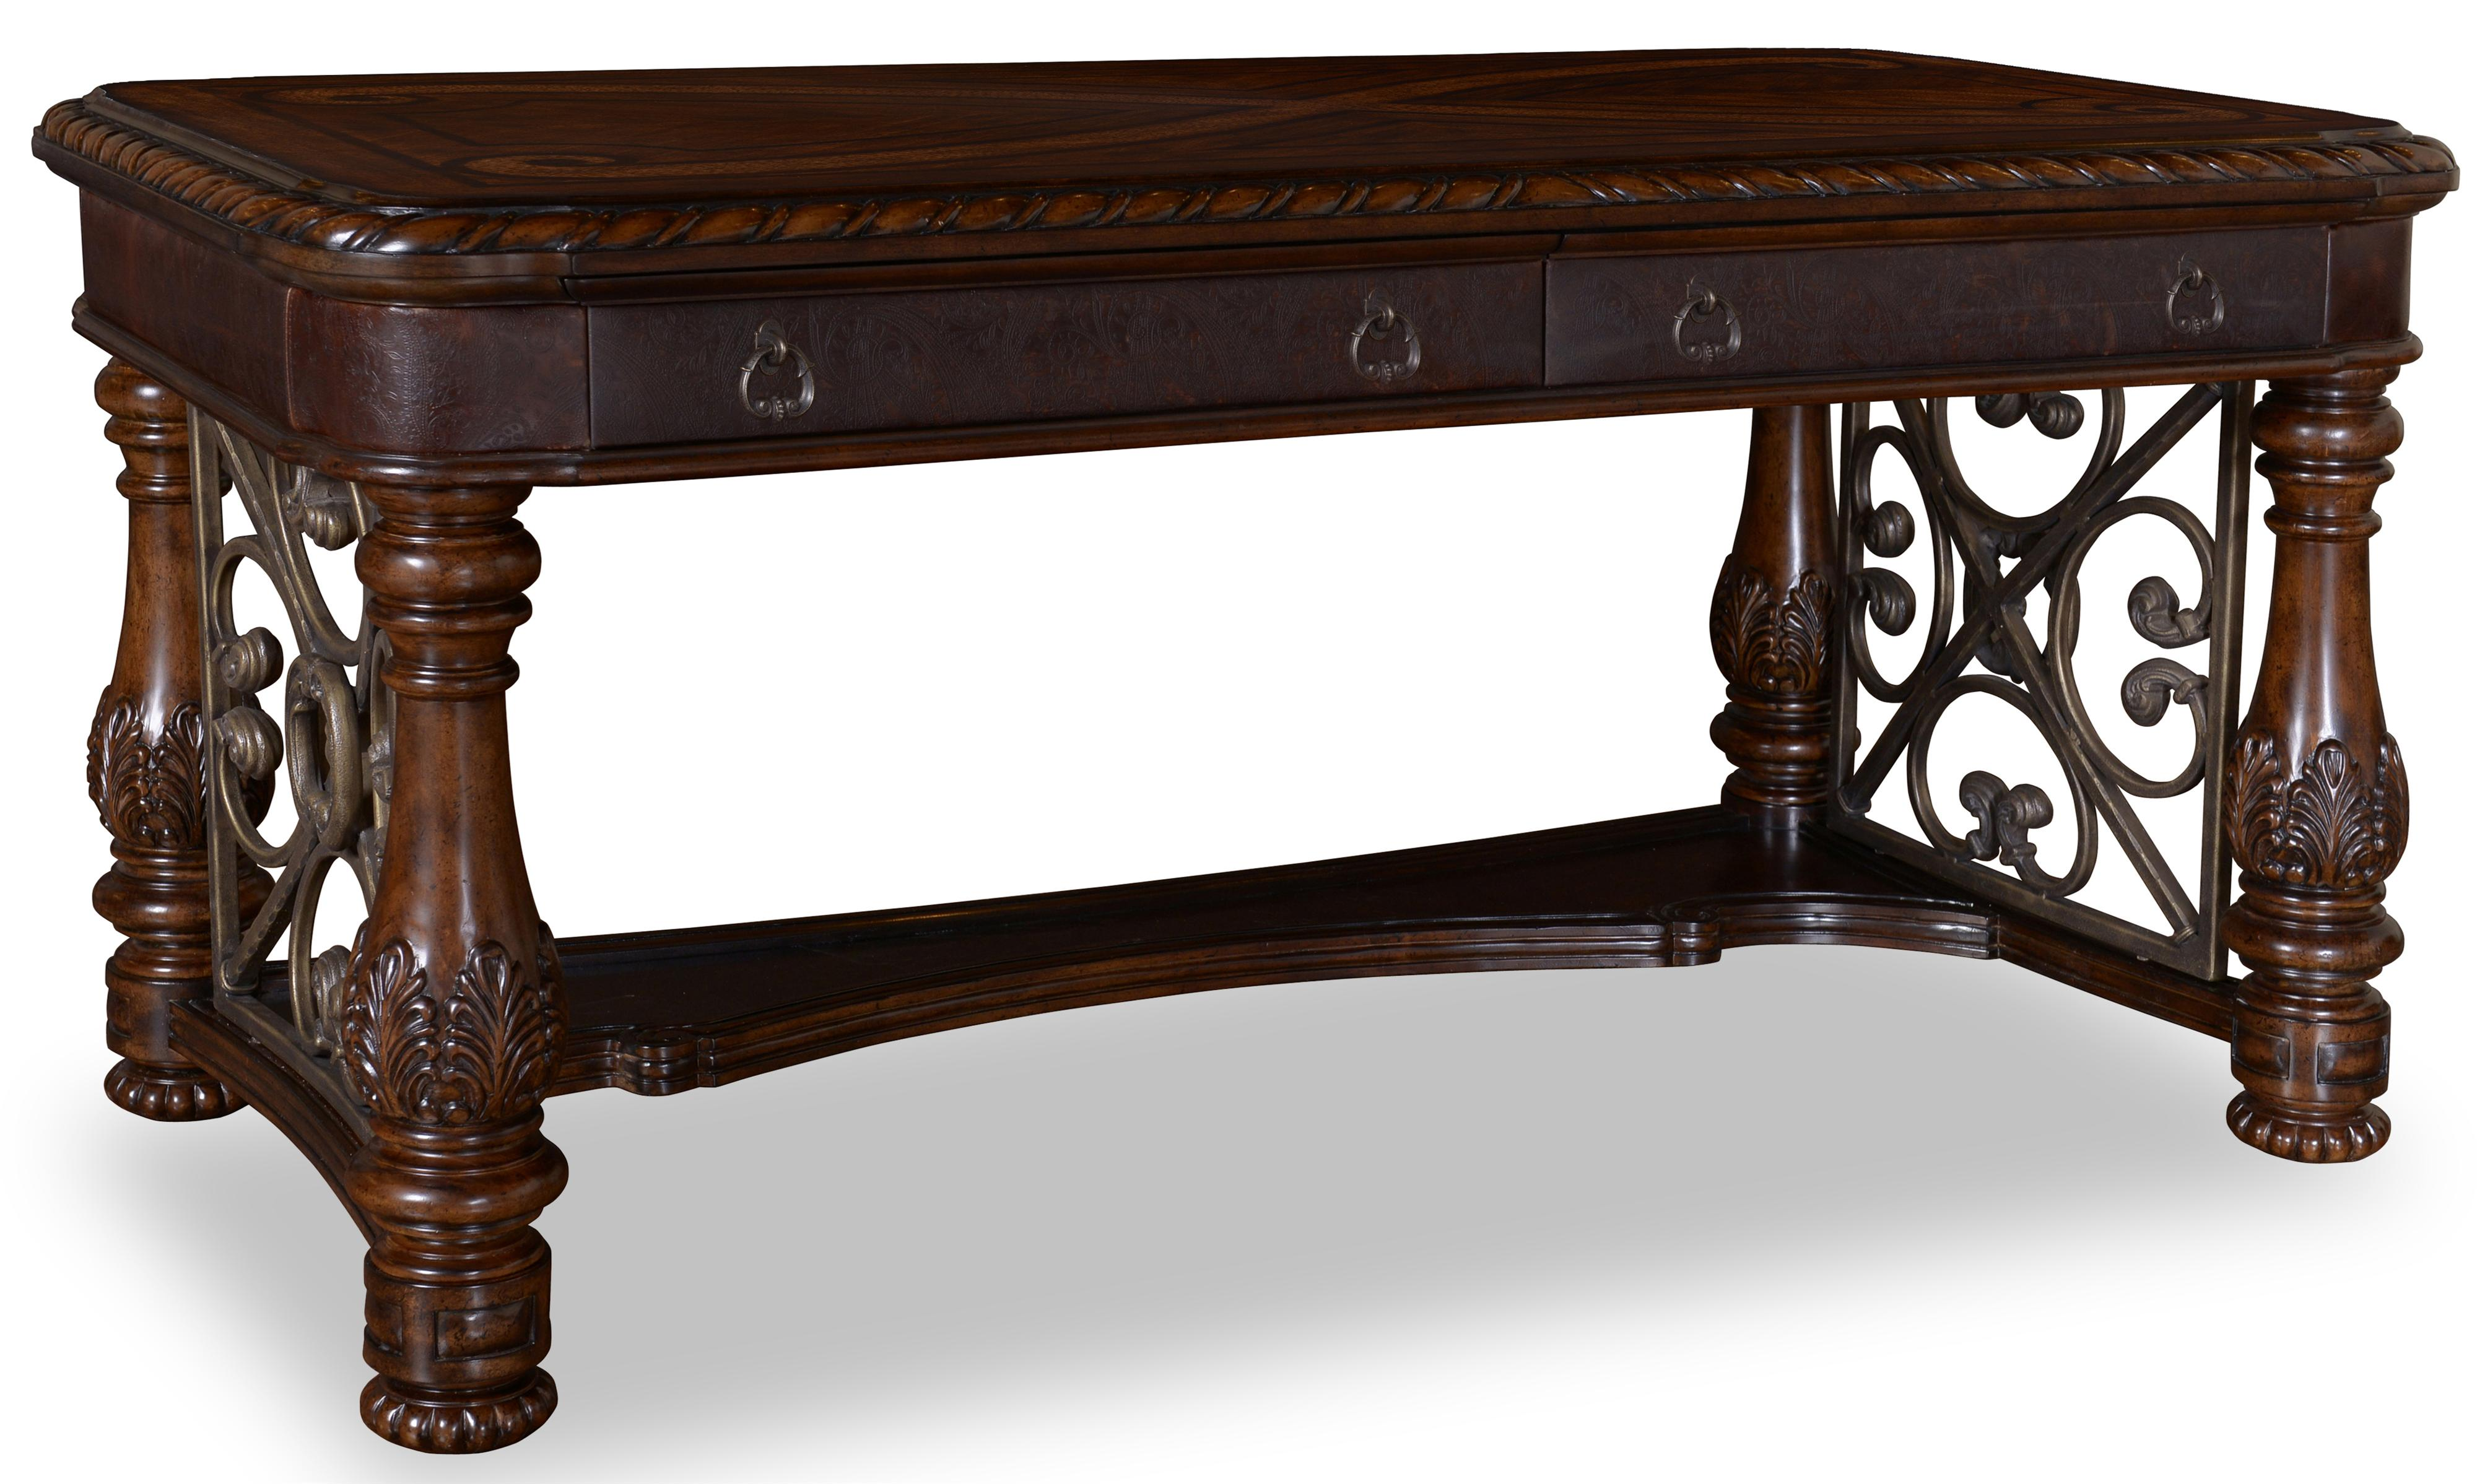 Belfort Signature Cortona Writing Desk - Item Number: 209421-2304